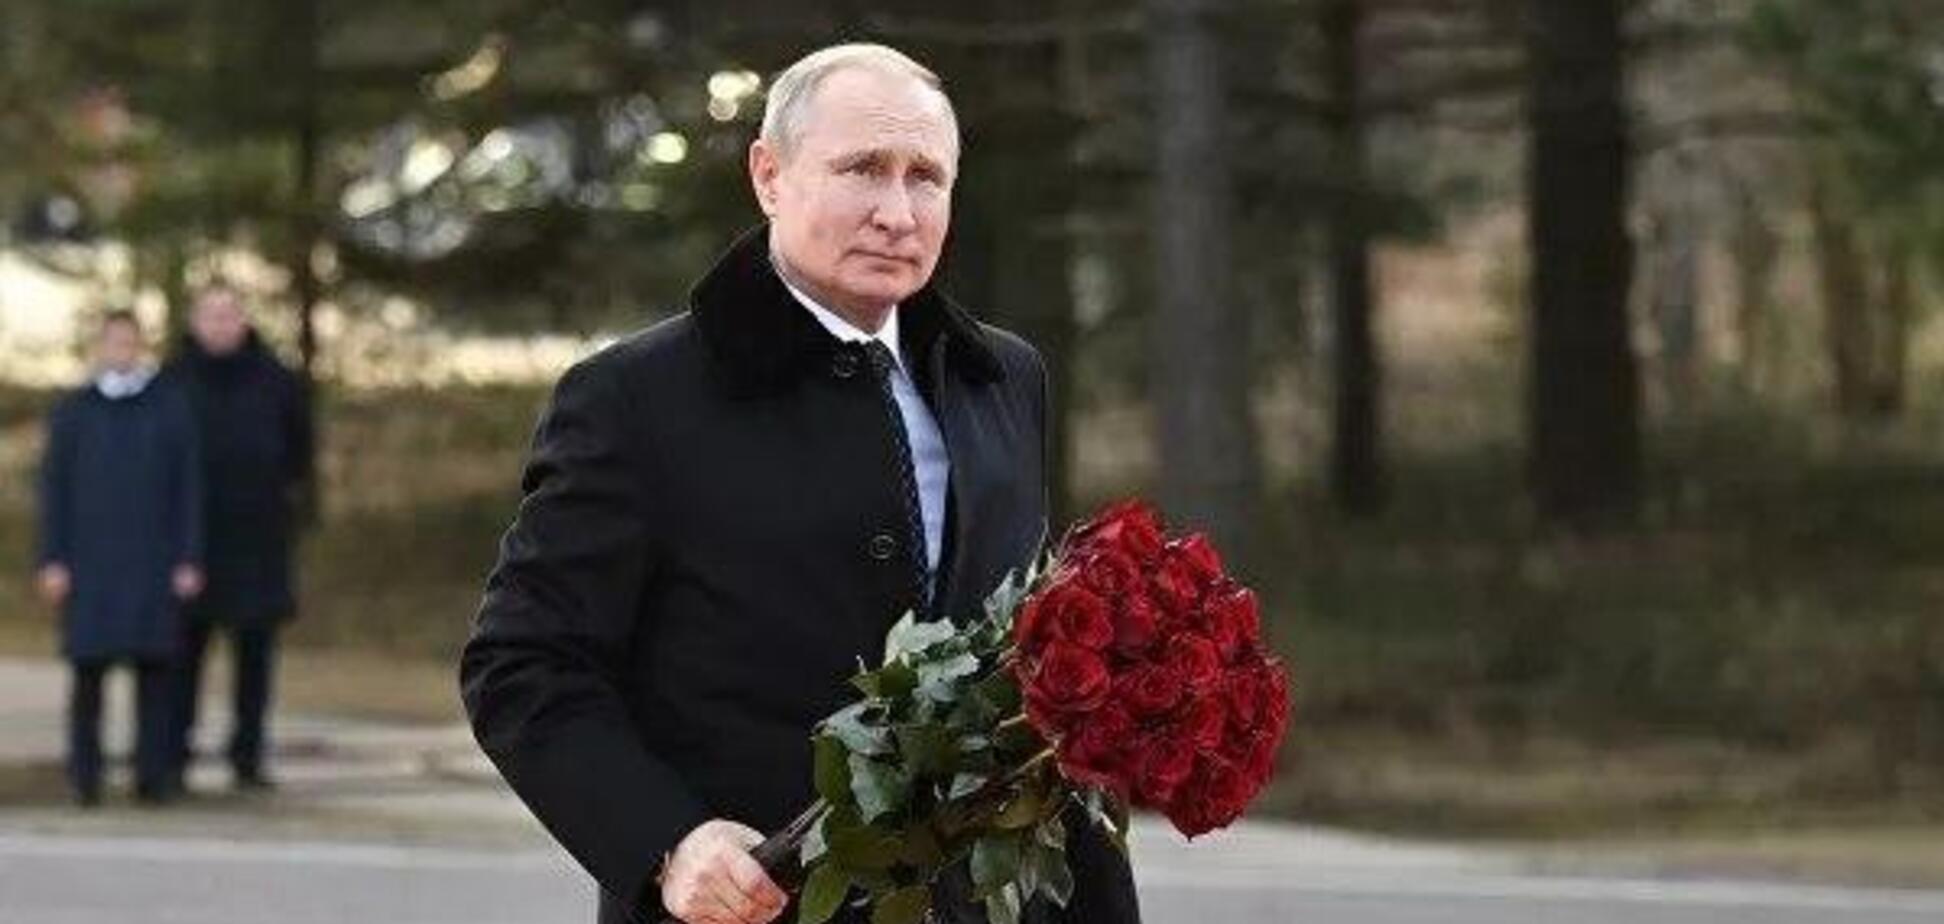 'Упырь все уничтожает!' Путина жестко разнесли за 'пиар на костях': фото и видео